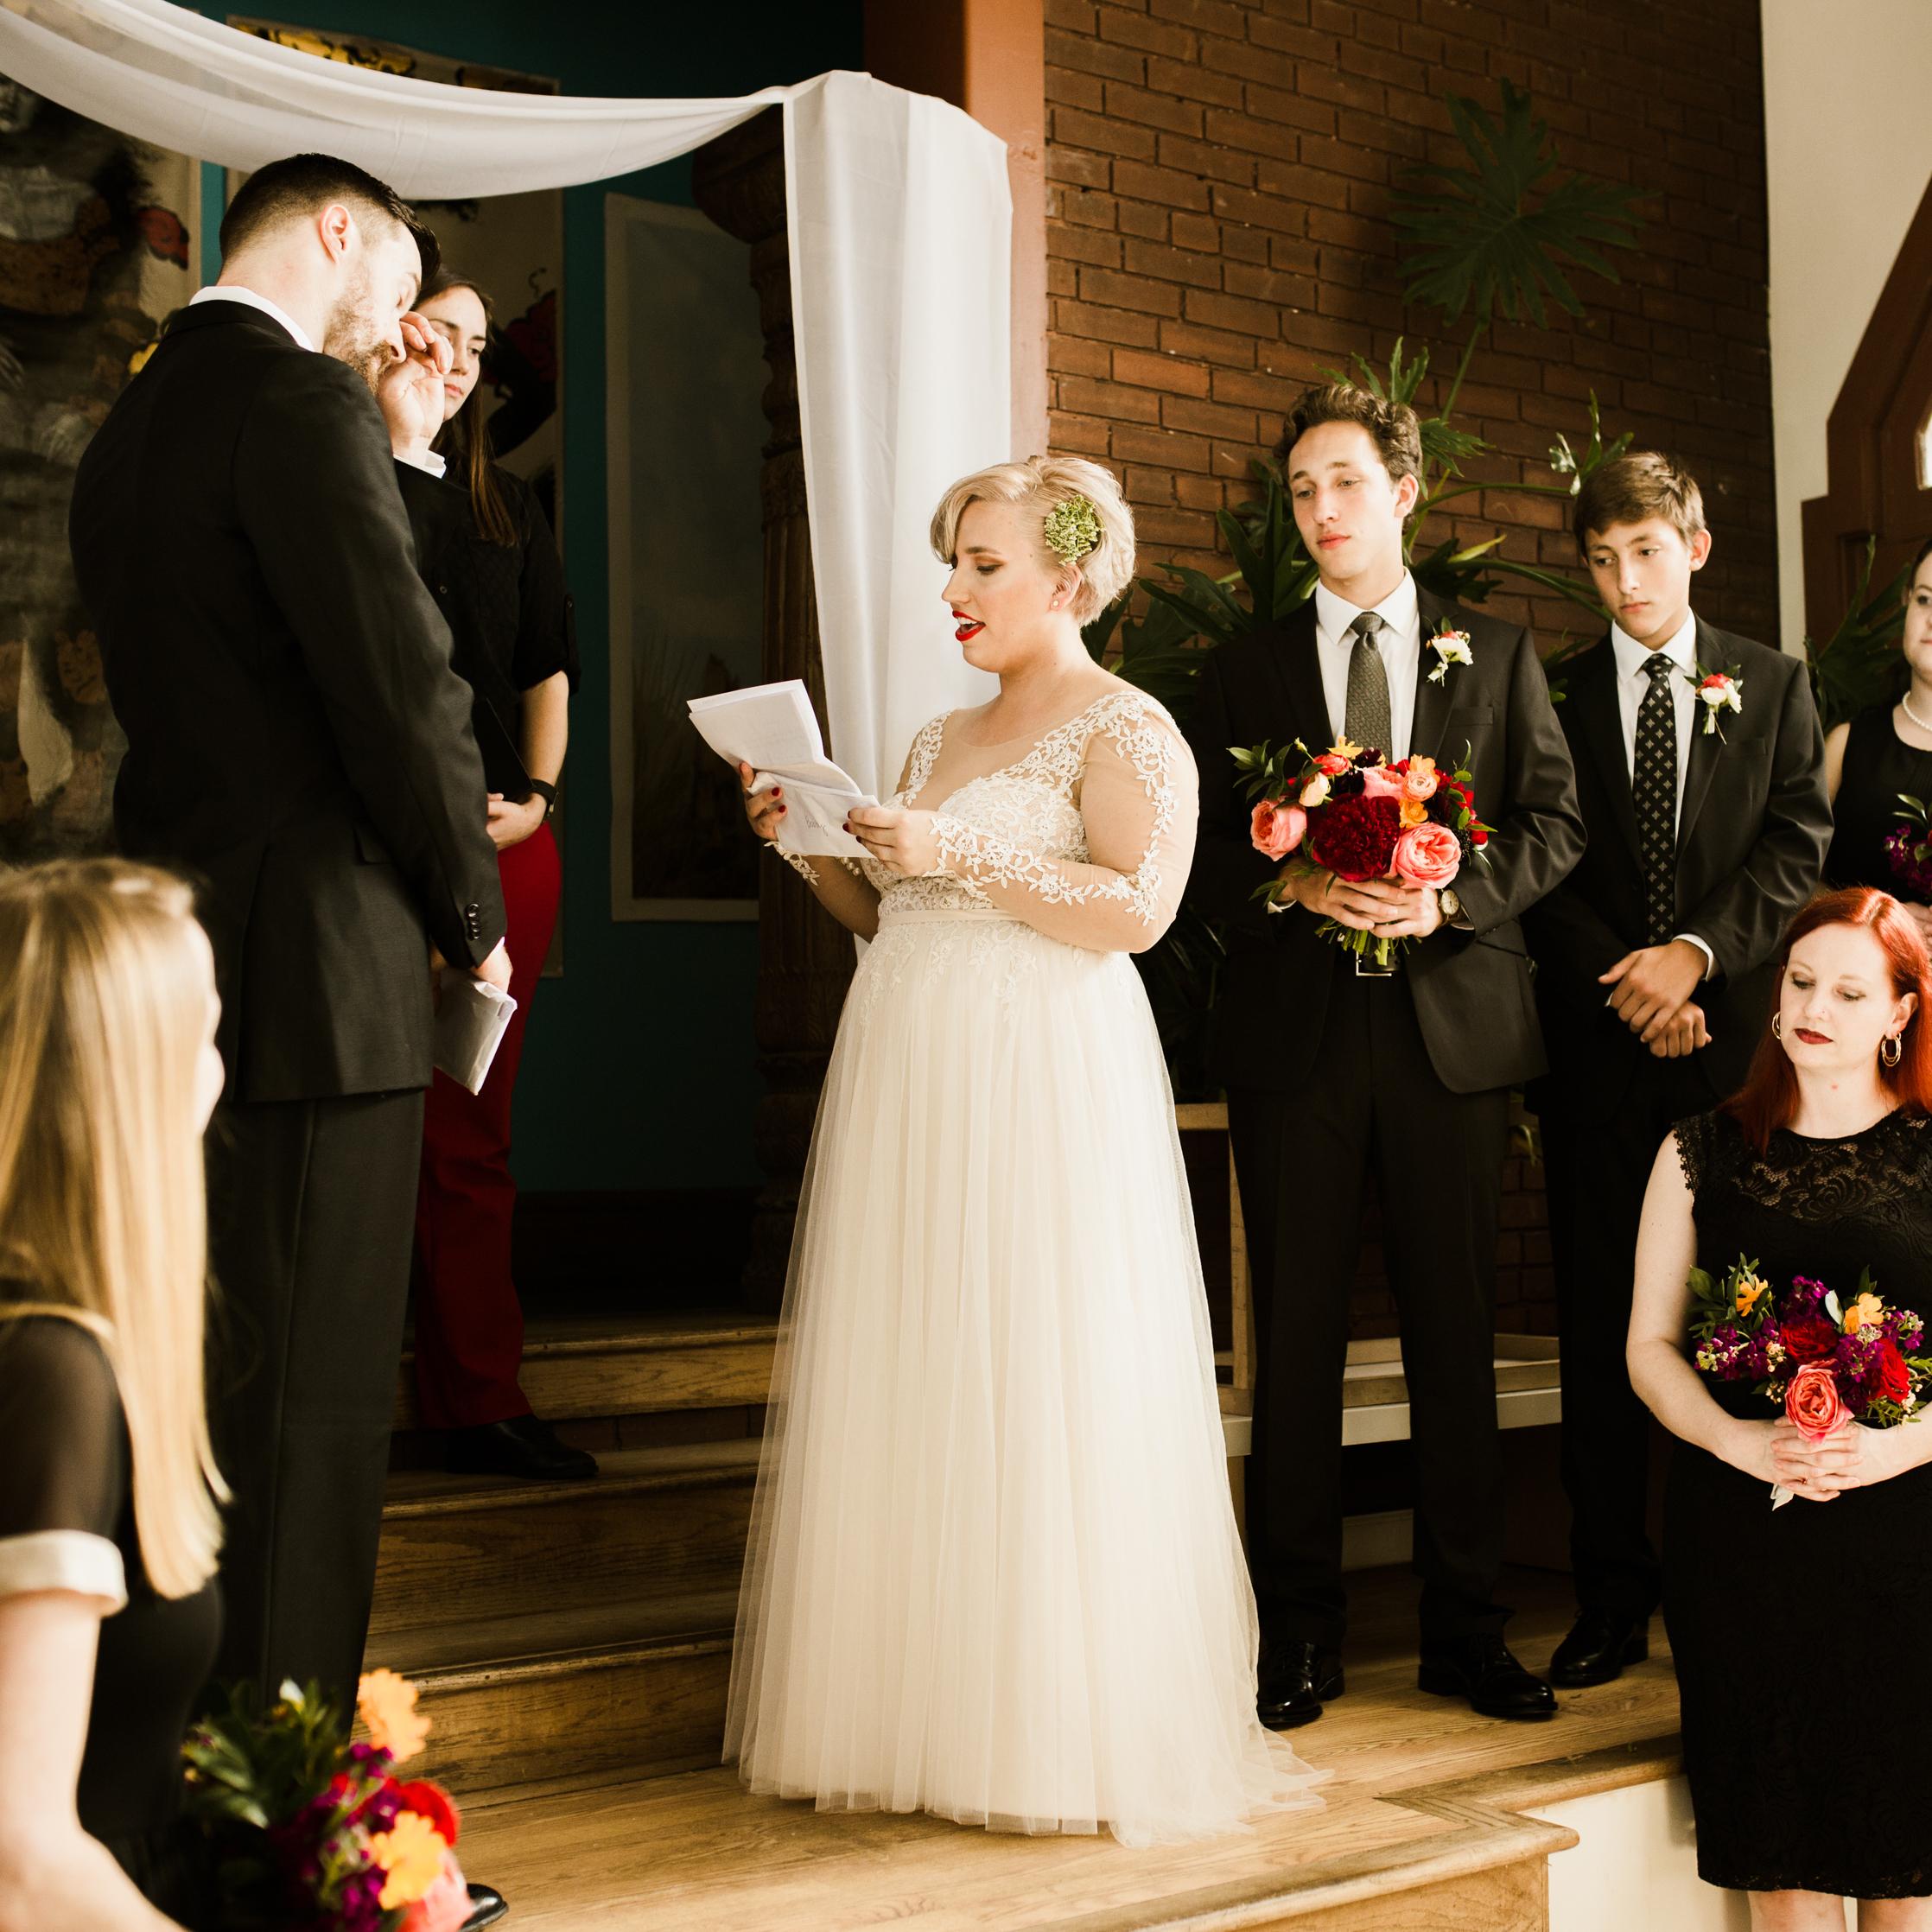 Kentucky Wedding Louisville Wedding Photographer 2018 Crystal Ludwick Photo Louisville Wedding Photographer Kentucky Wedding Photographer (37 of 105).jpg